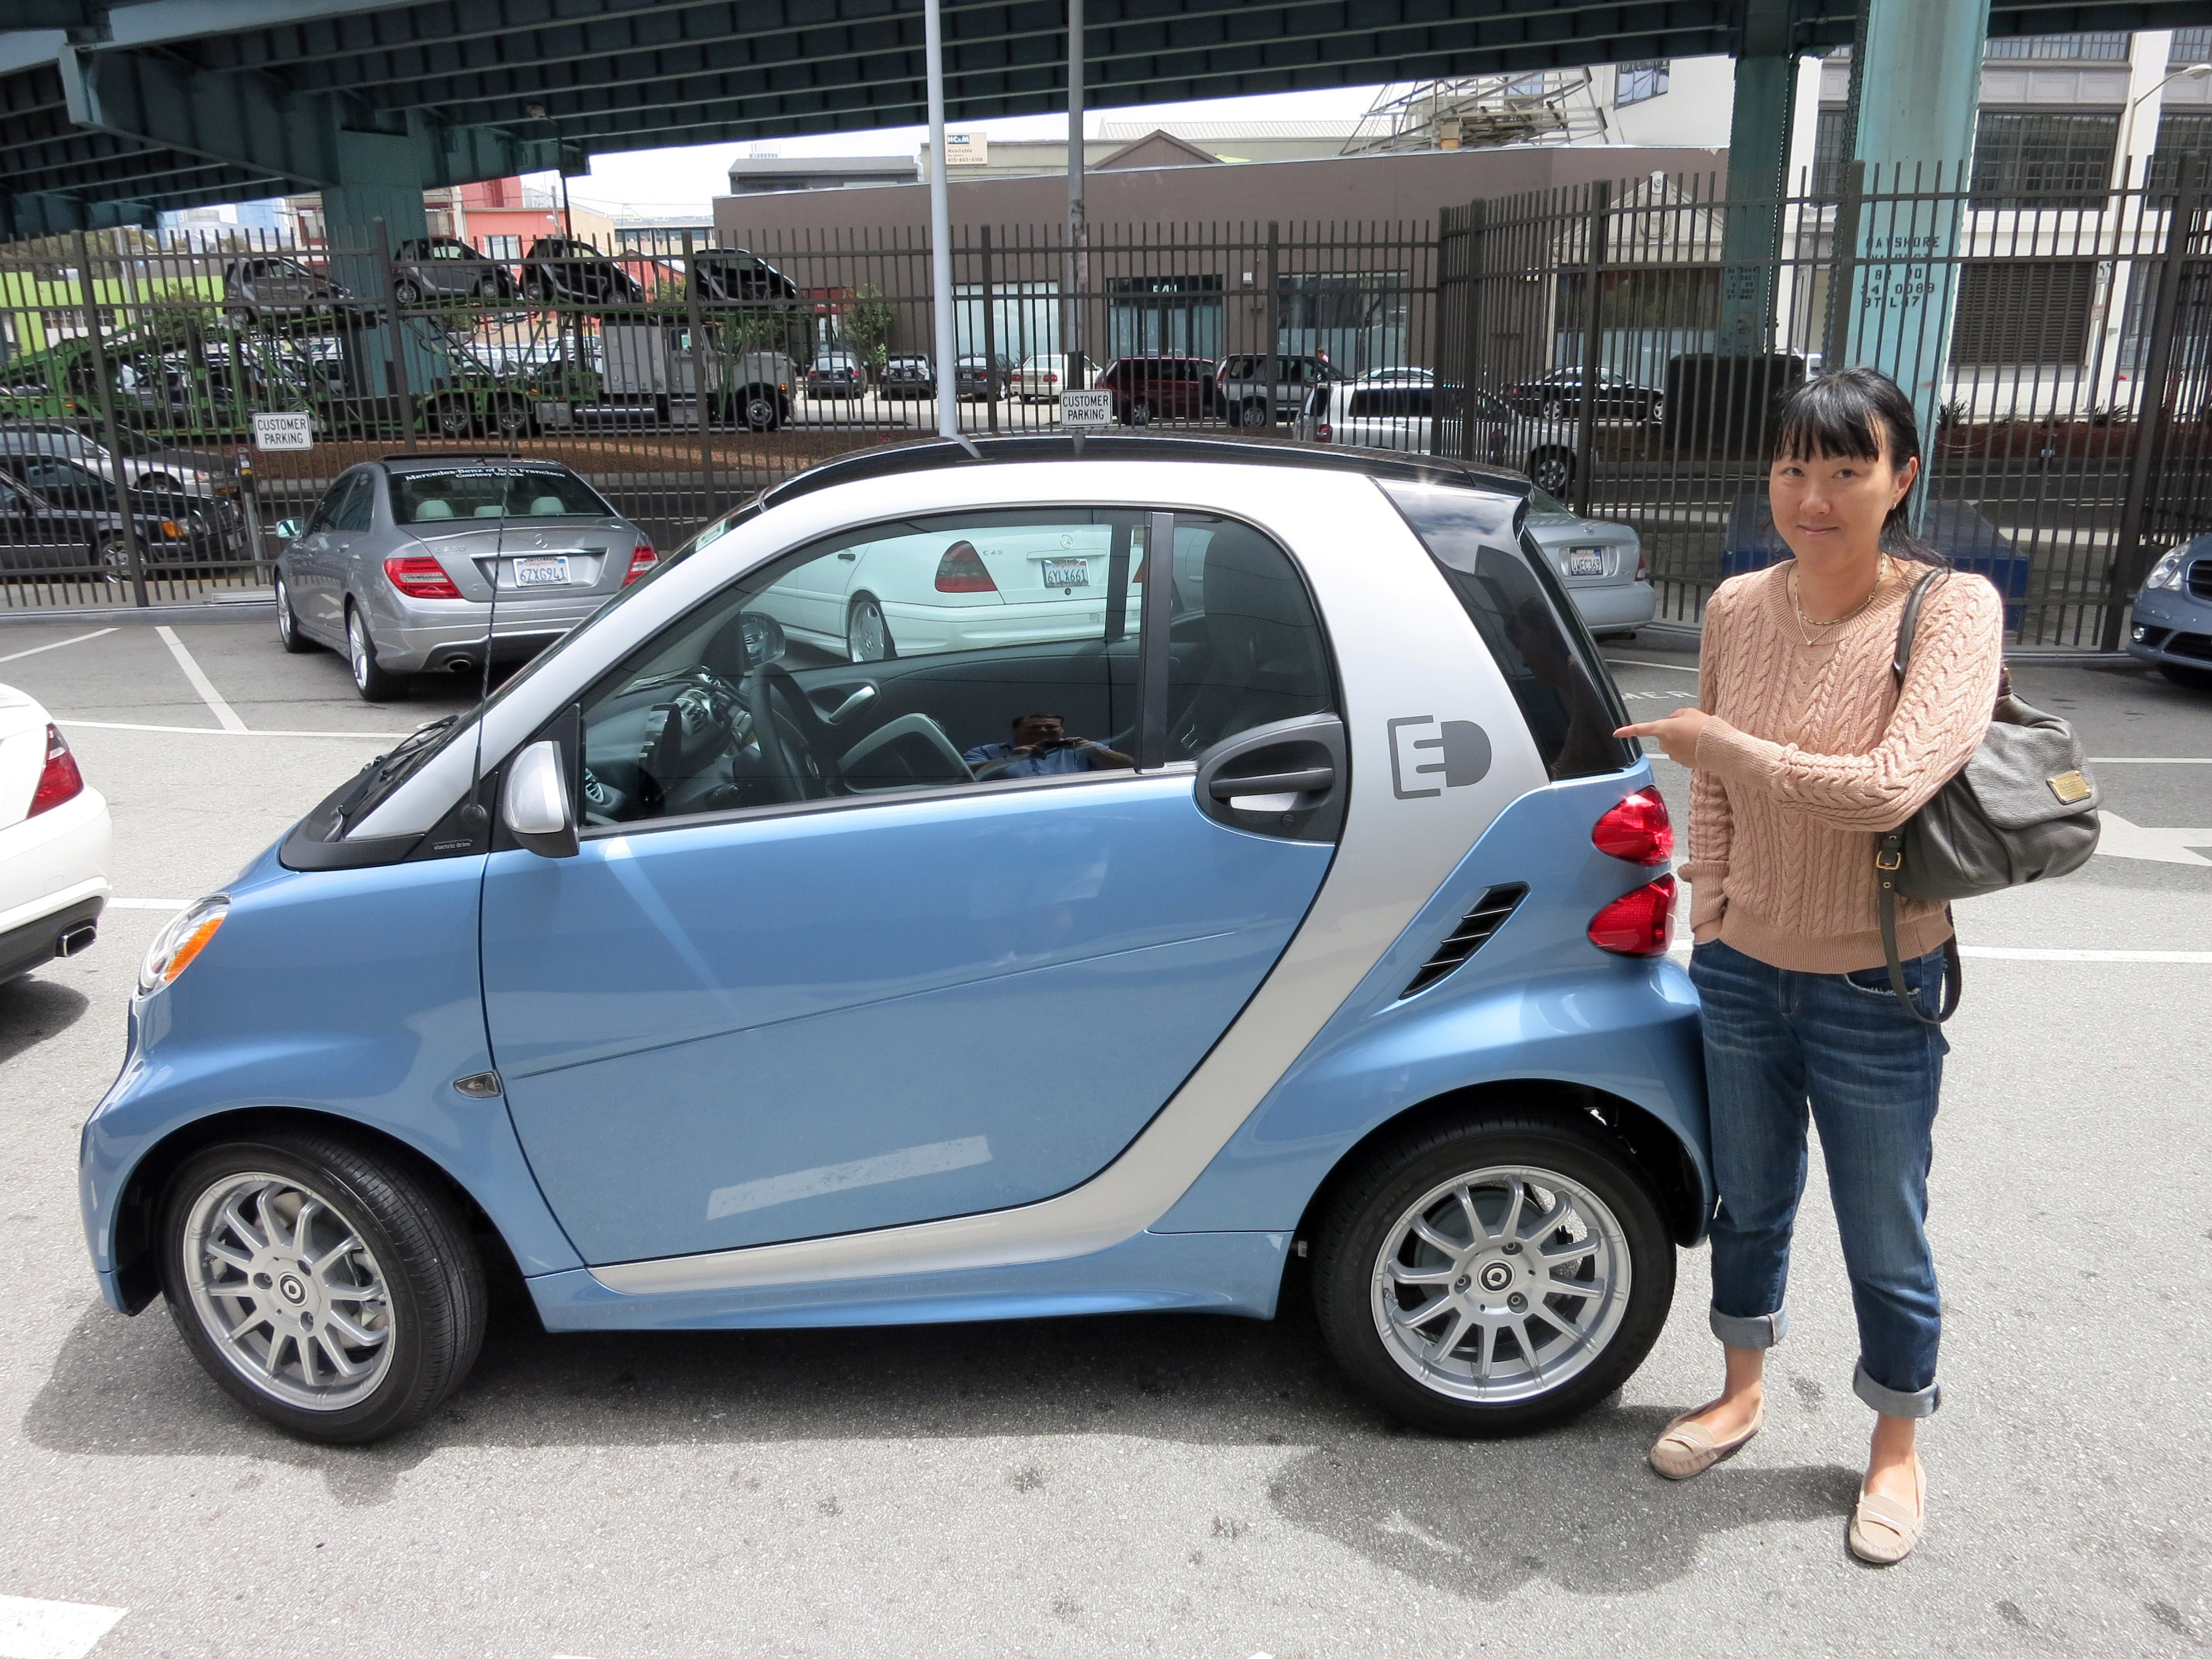 p07b_2013_07_17_electric_smartcar_testdrive.jpg